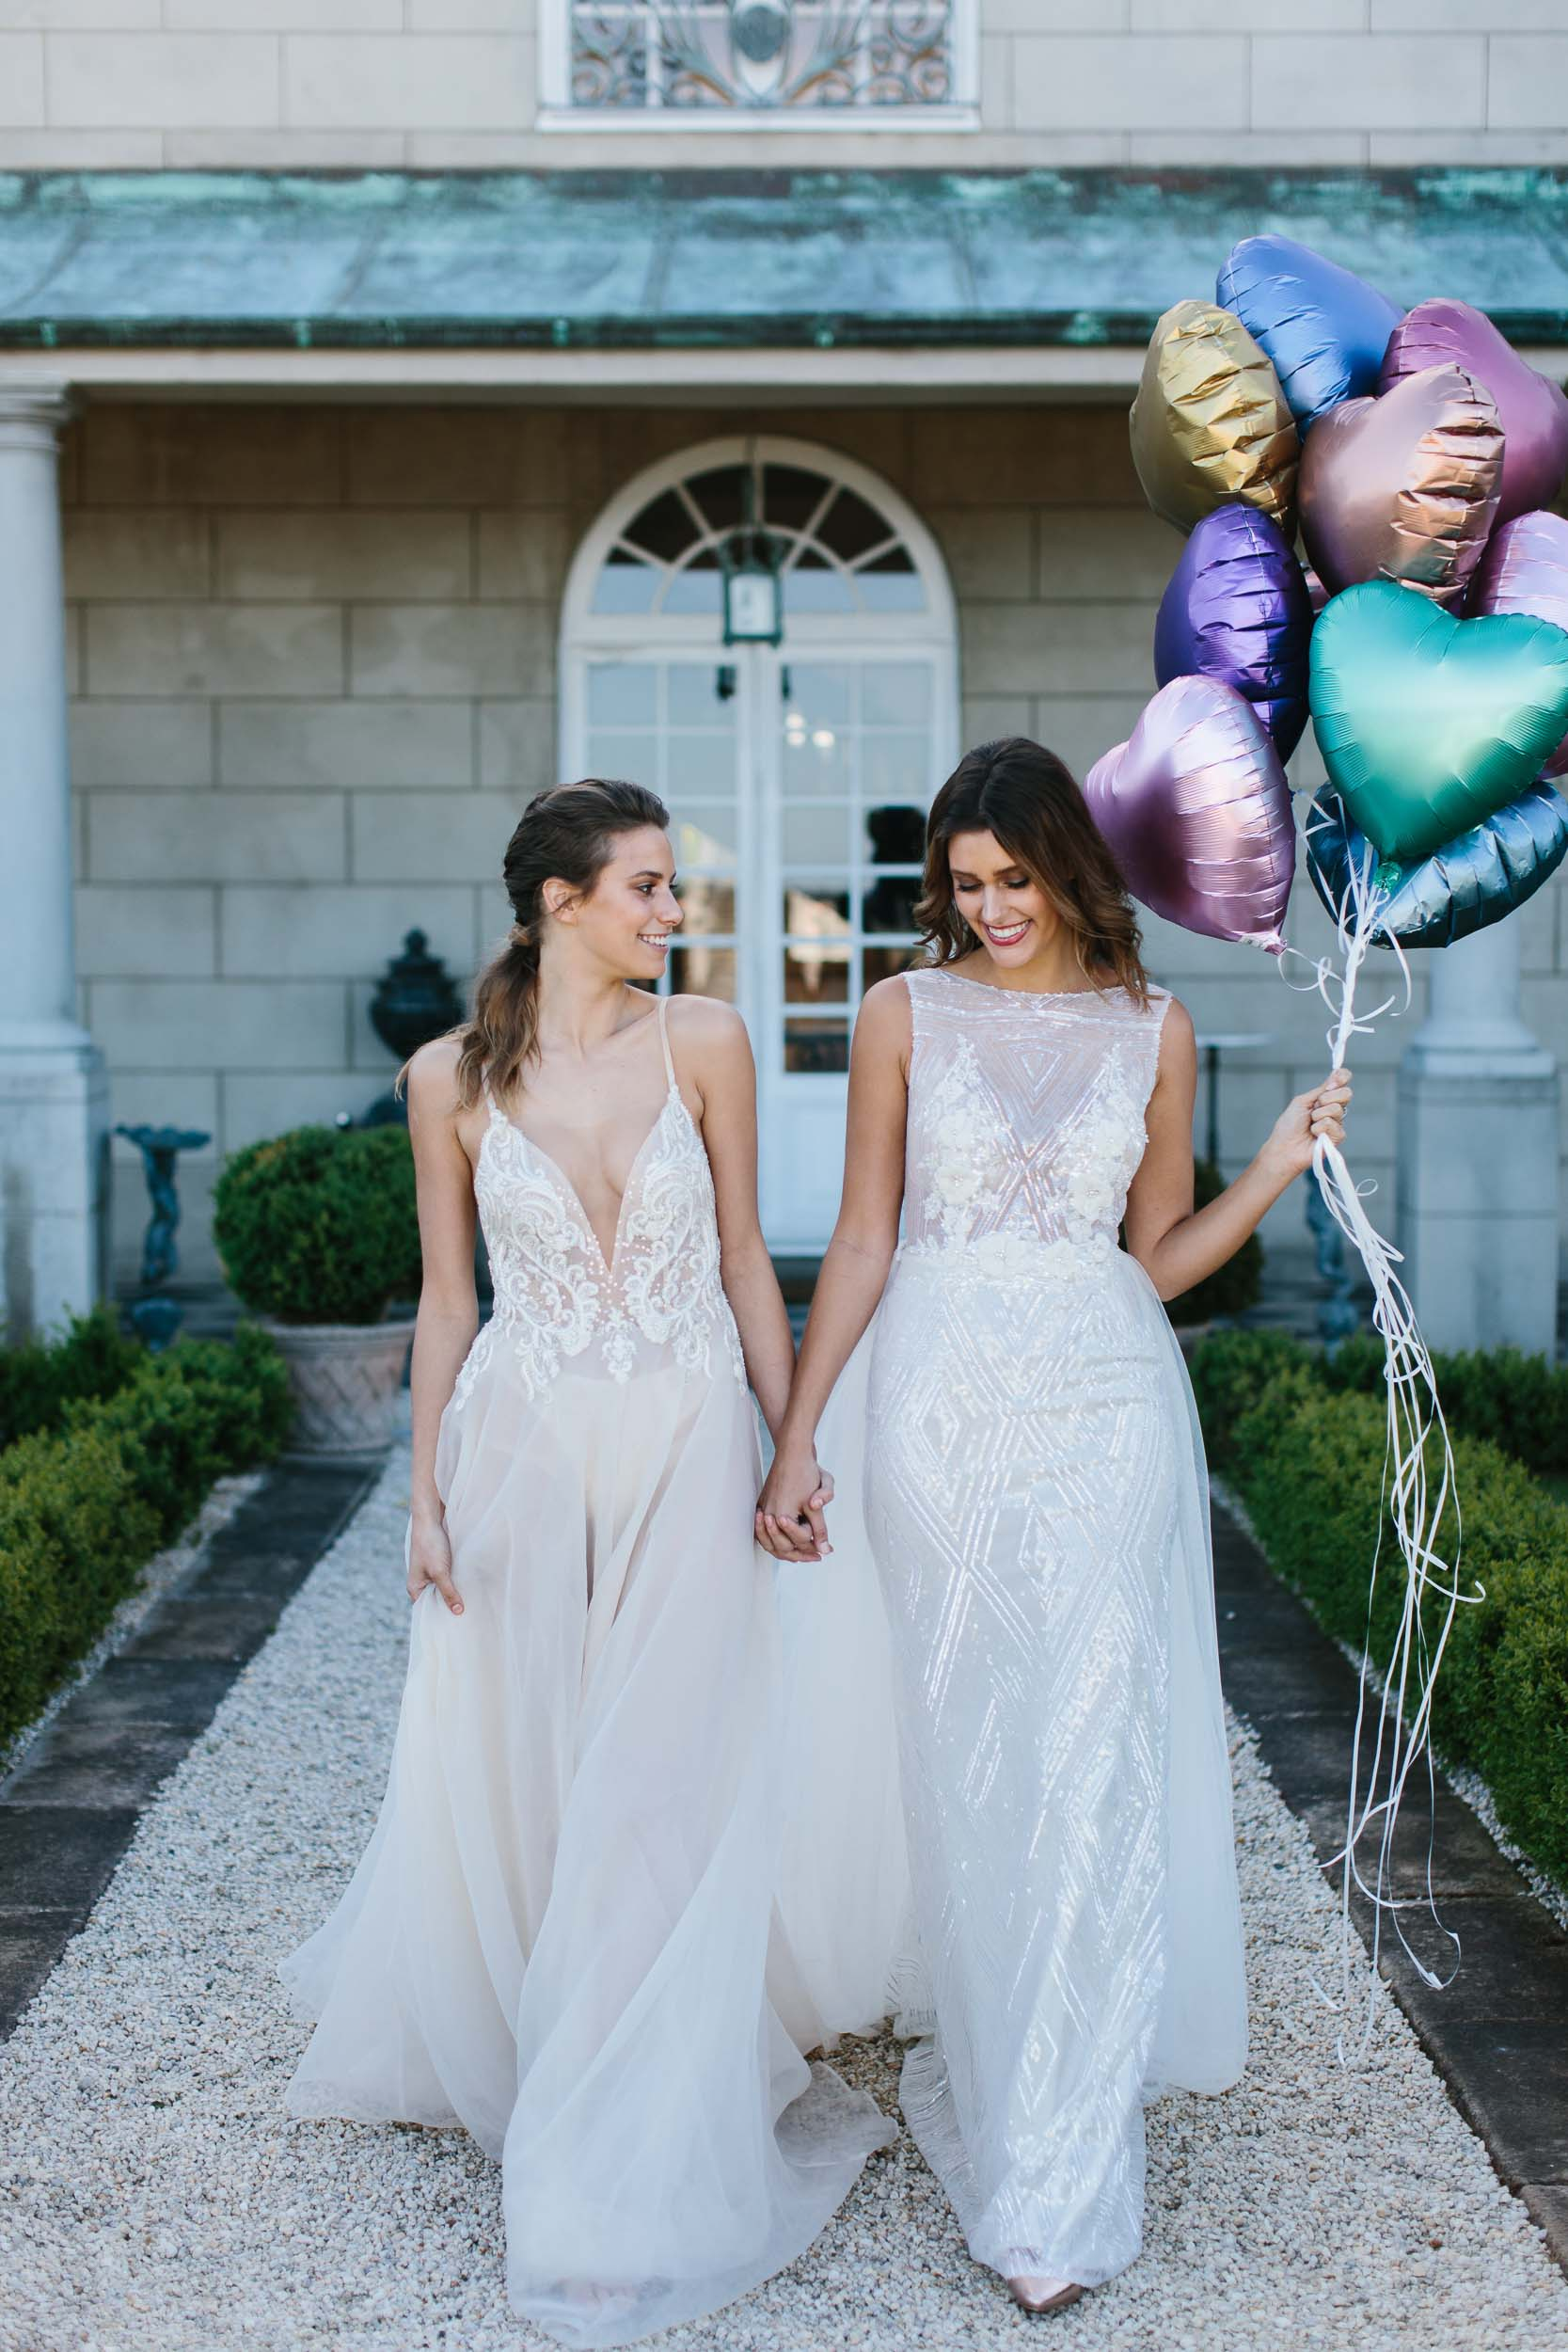 Same Sex Couple Wedding Photo | Wedding Photography by Kas Richards